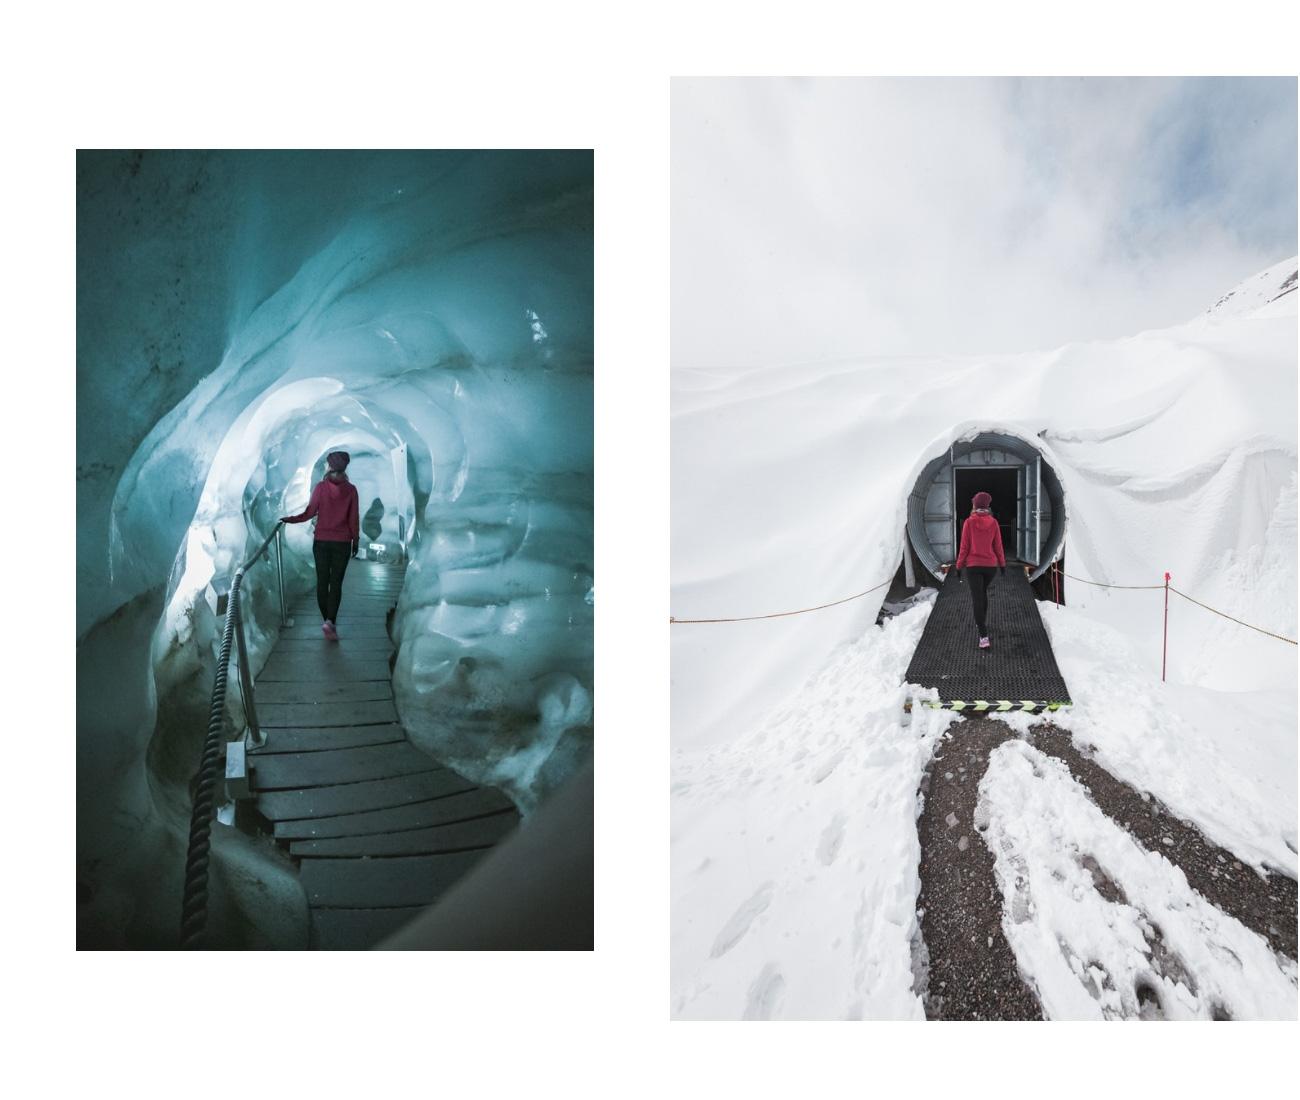 Jaskinia lodowa Stubai